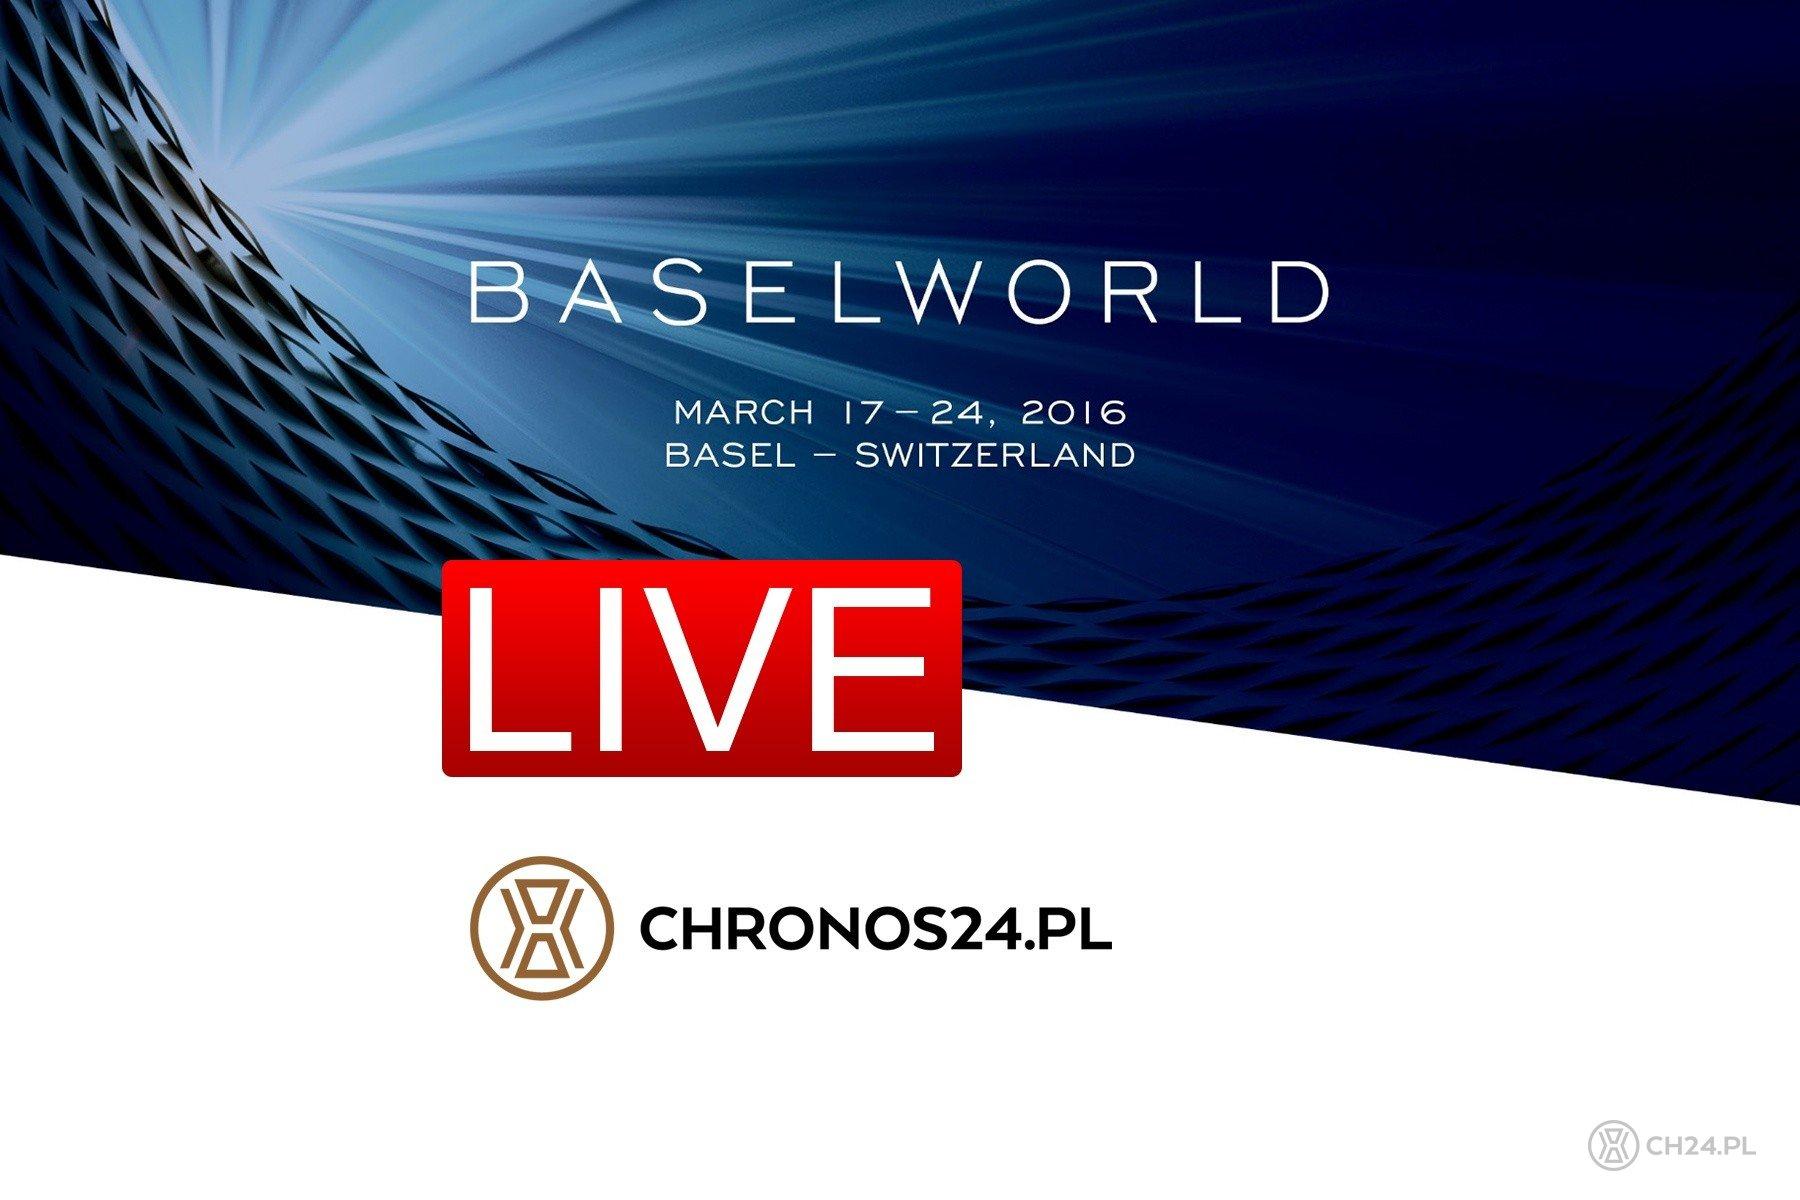 BaselWorld 2016 LIVE na CH24.PL